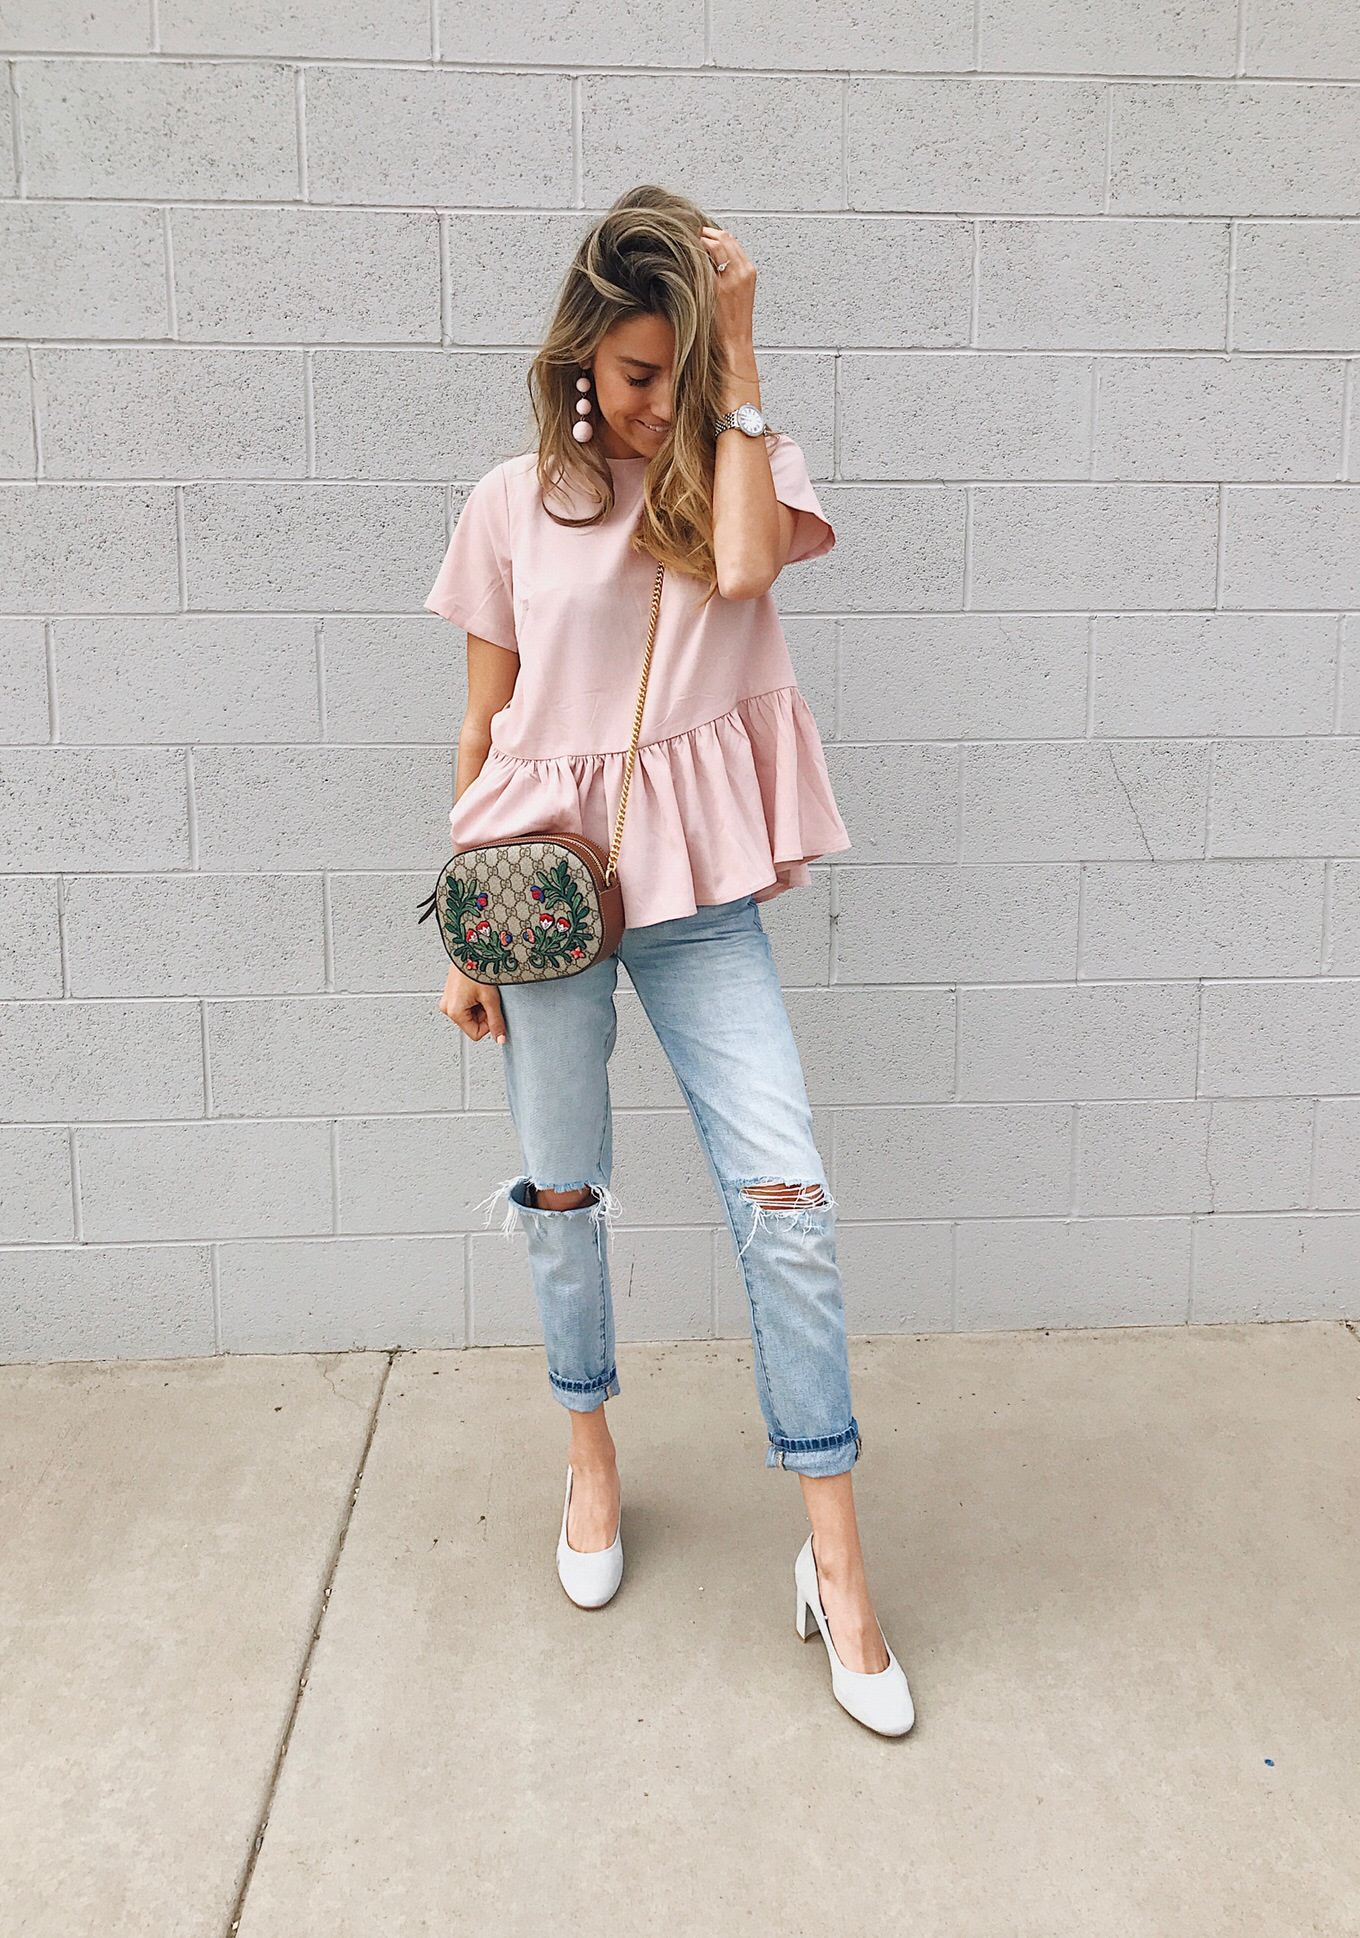 16 feminine casual style ideas